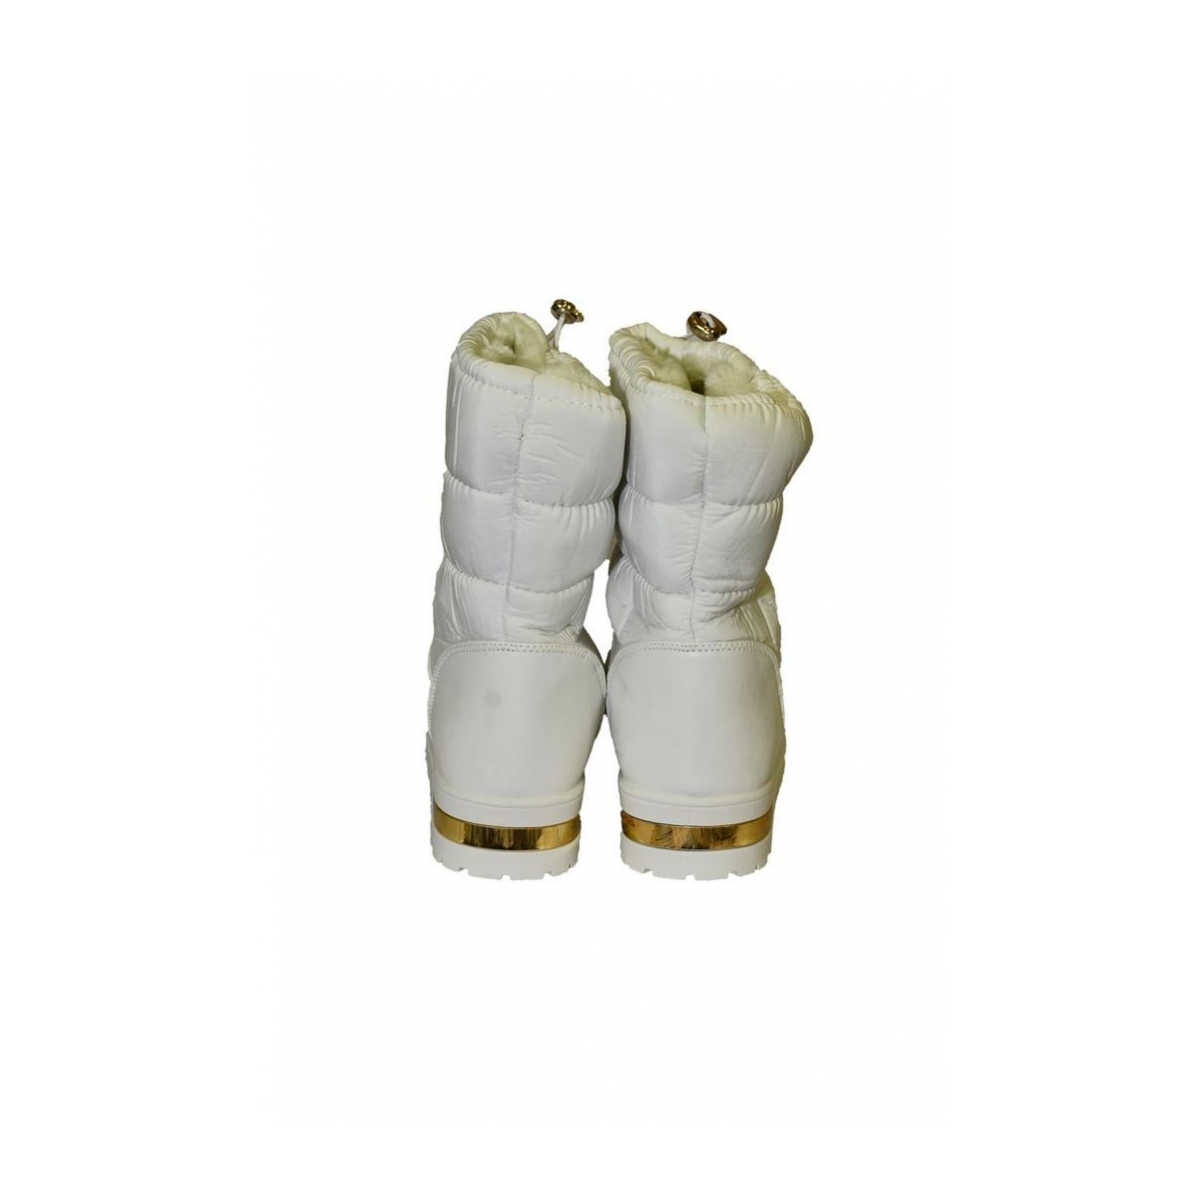 Dámske biele čižmy SARA - 4 d84a7fe214c